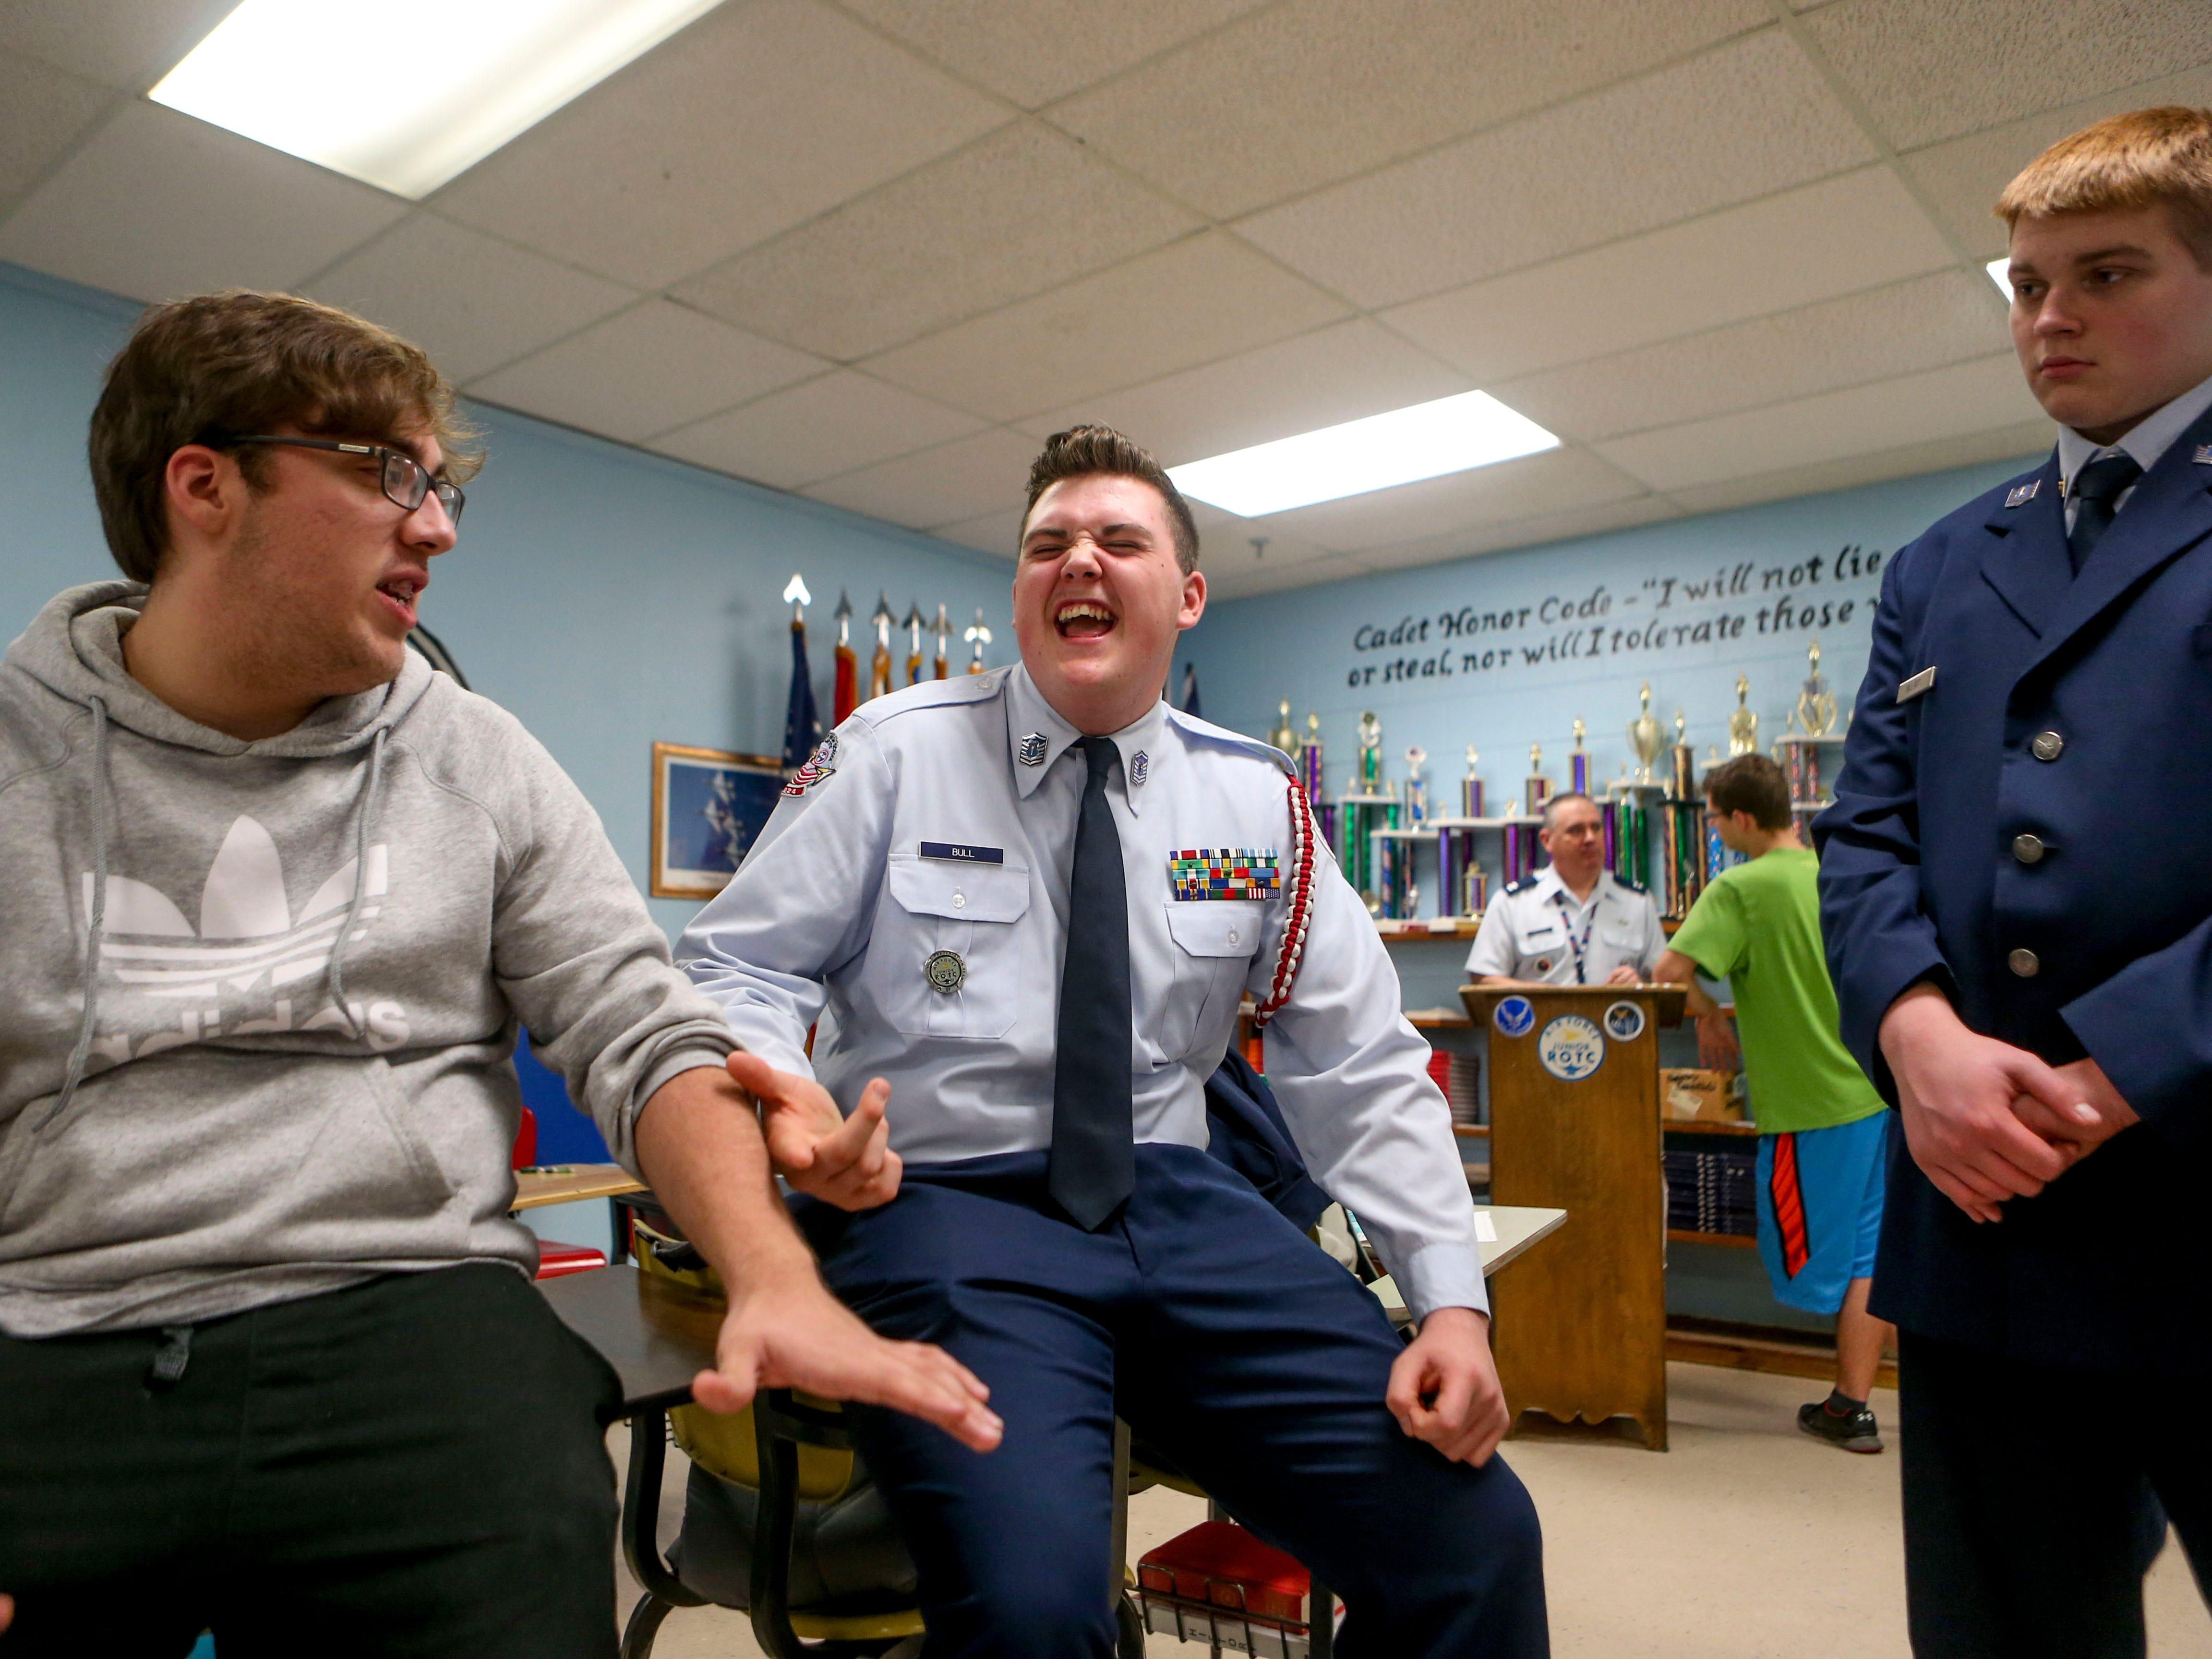 Trevor Woods, 17, left, a senior, and Kaleb Bull, 17, center, a sophomore, joke around during ROTC class at Lexington High School in Lexington, Tenn., on Wednesday, Feb. 6, 2019.